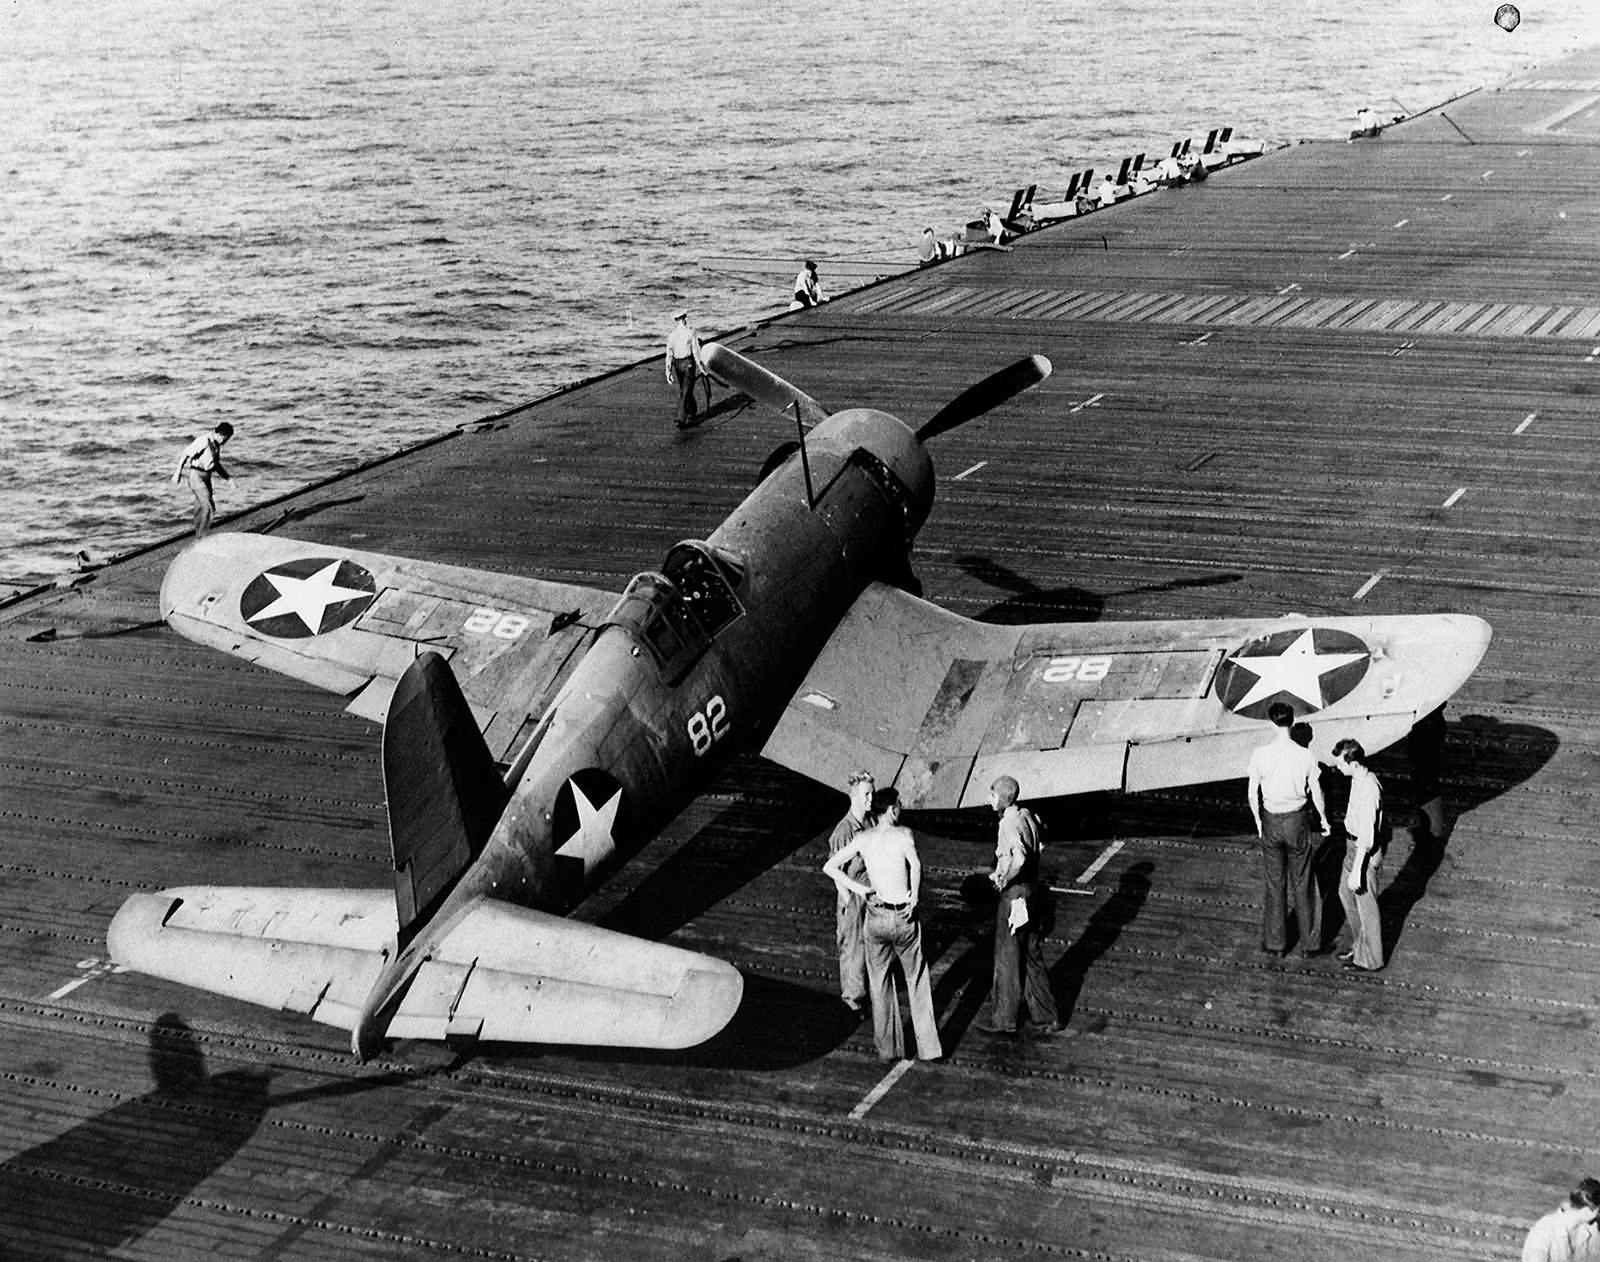 F4U-1_Corsair_82_of_VF-10_on_the_flight_